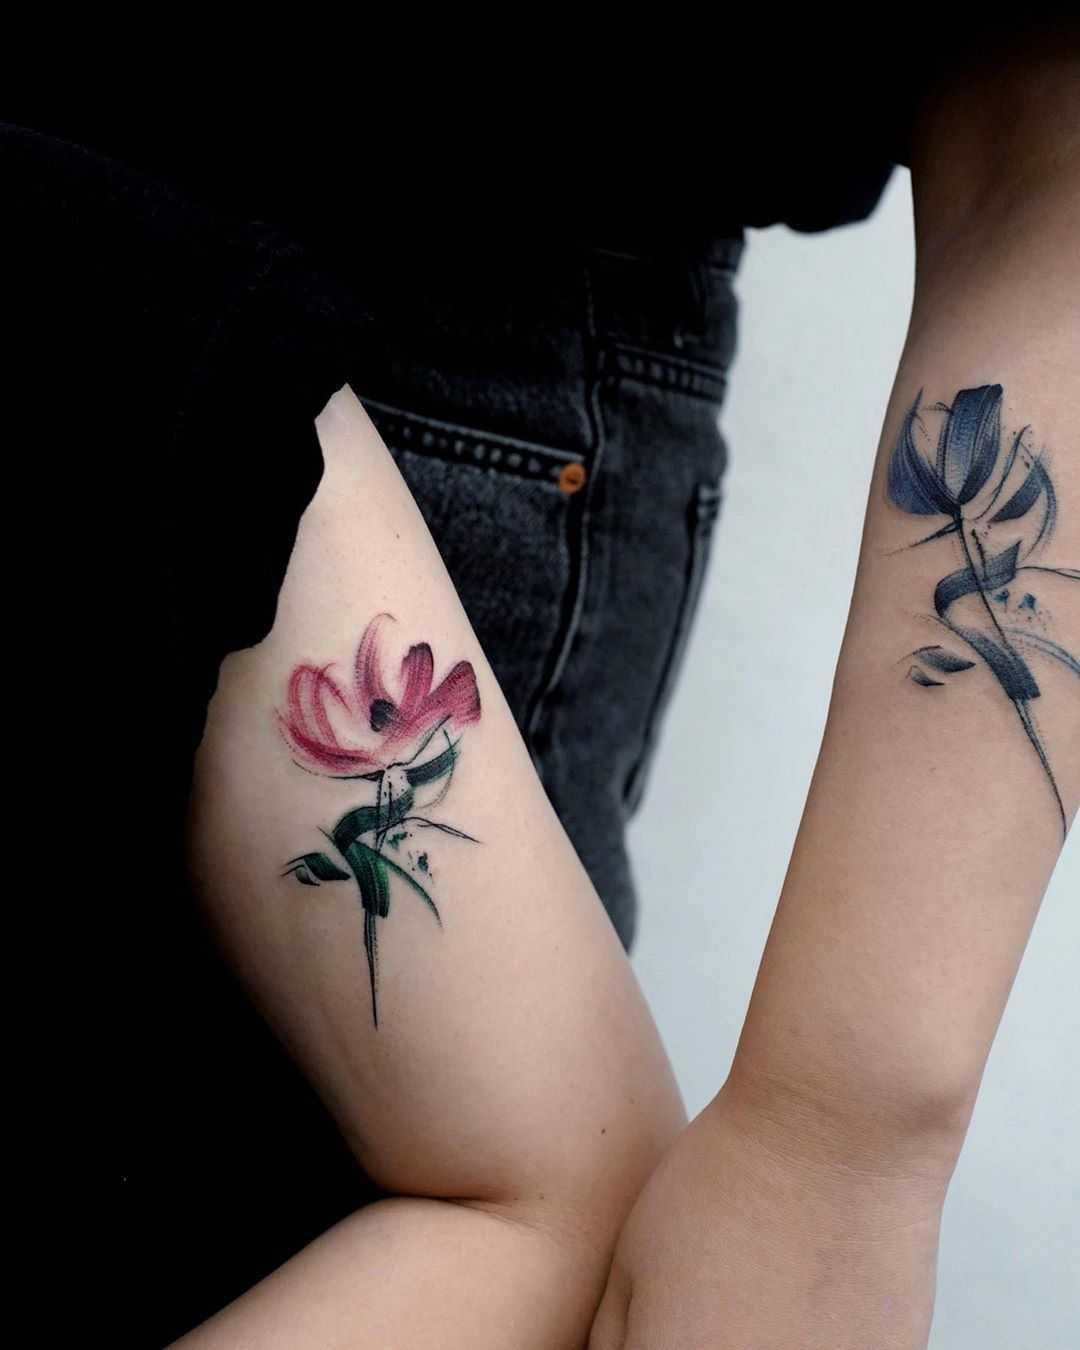 Friendship flowers by @tattoo_a_piece